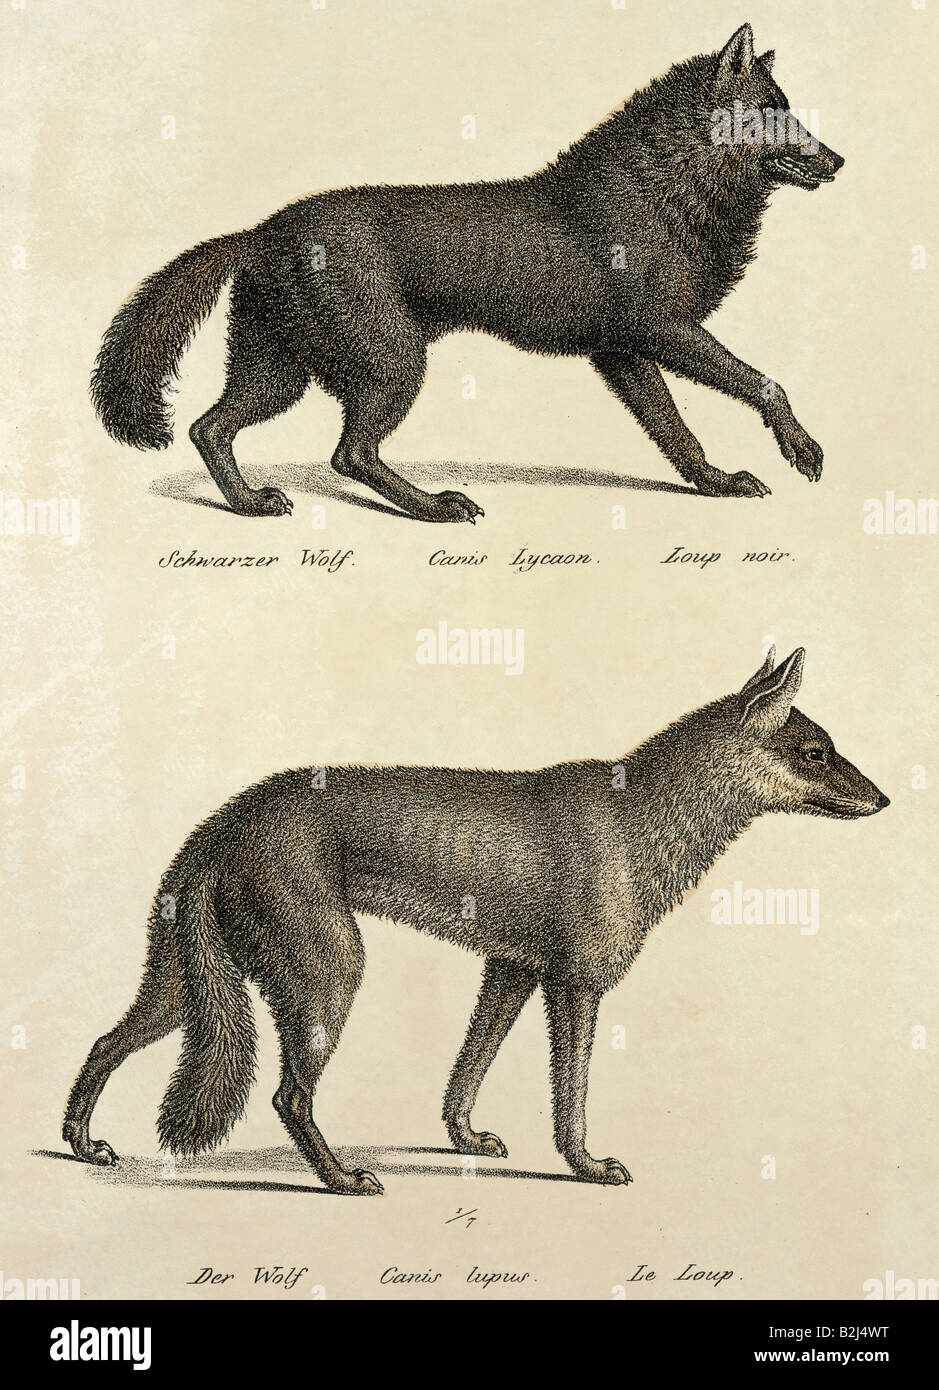 zoology / animal, mammal / mammalian, wolfs, above: Eastern Wolf (Canis lupus lycaon), below: Eurasian Wolf (Canis - Stock Image